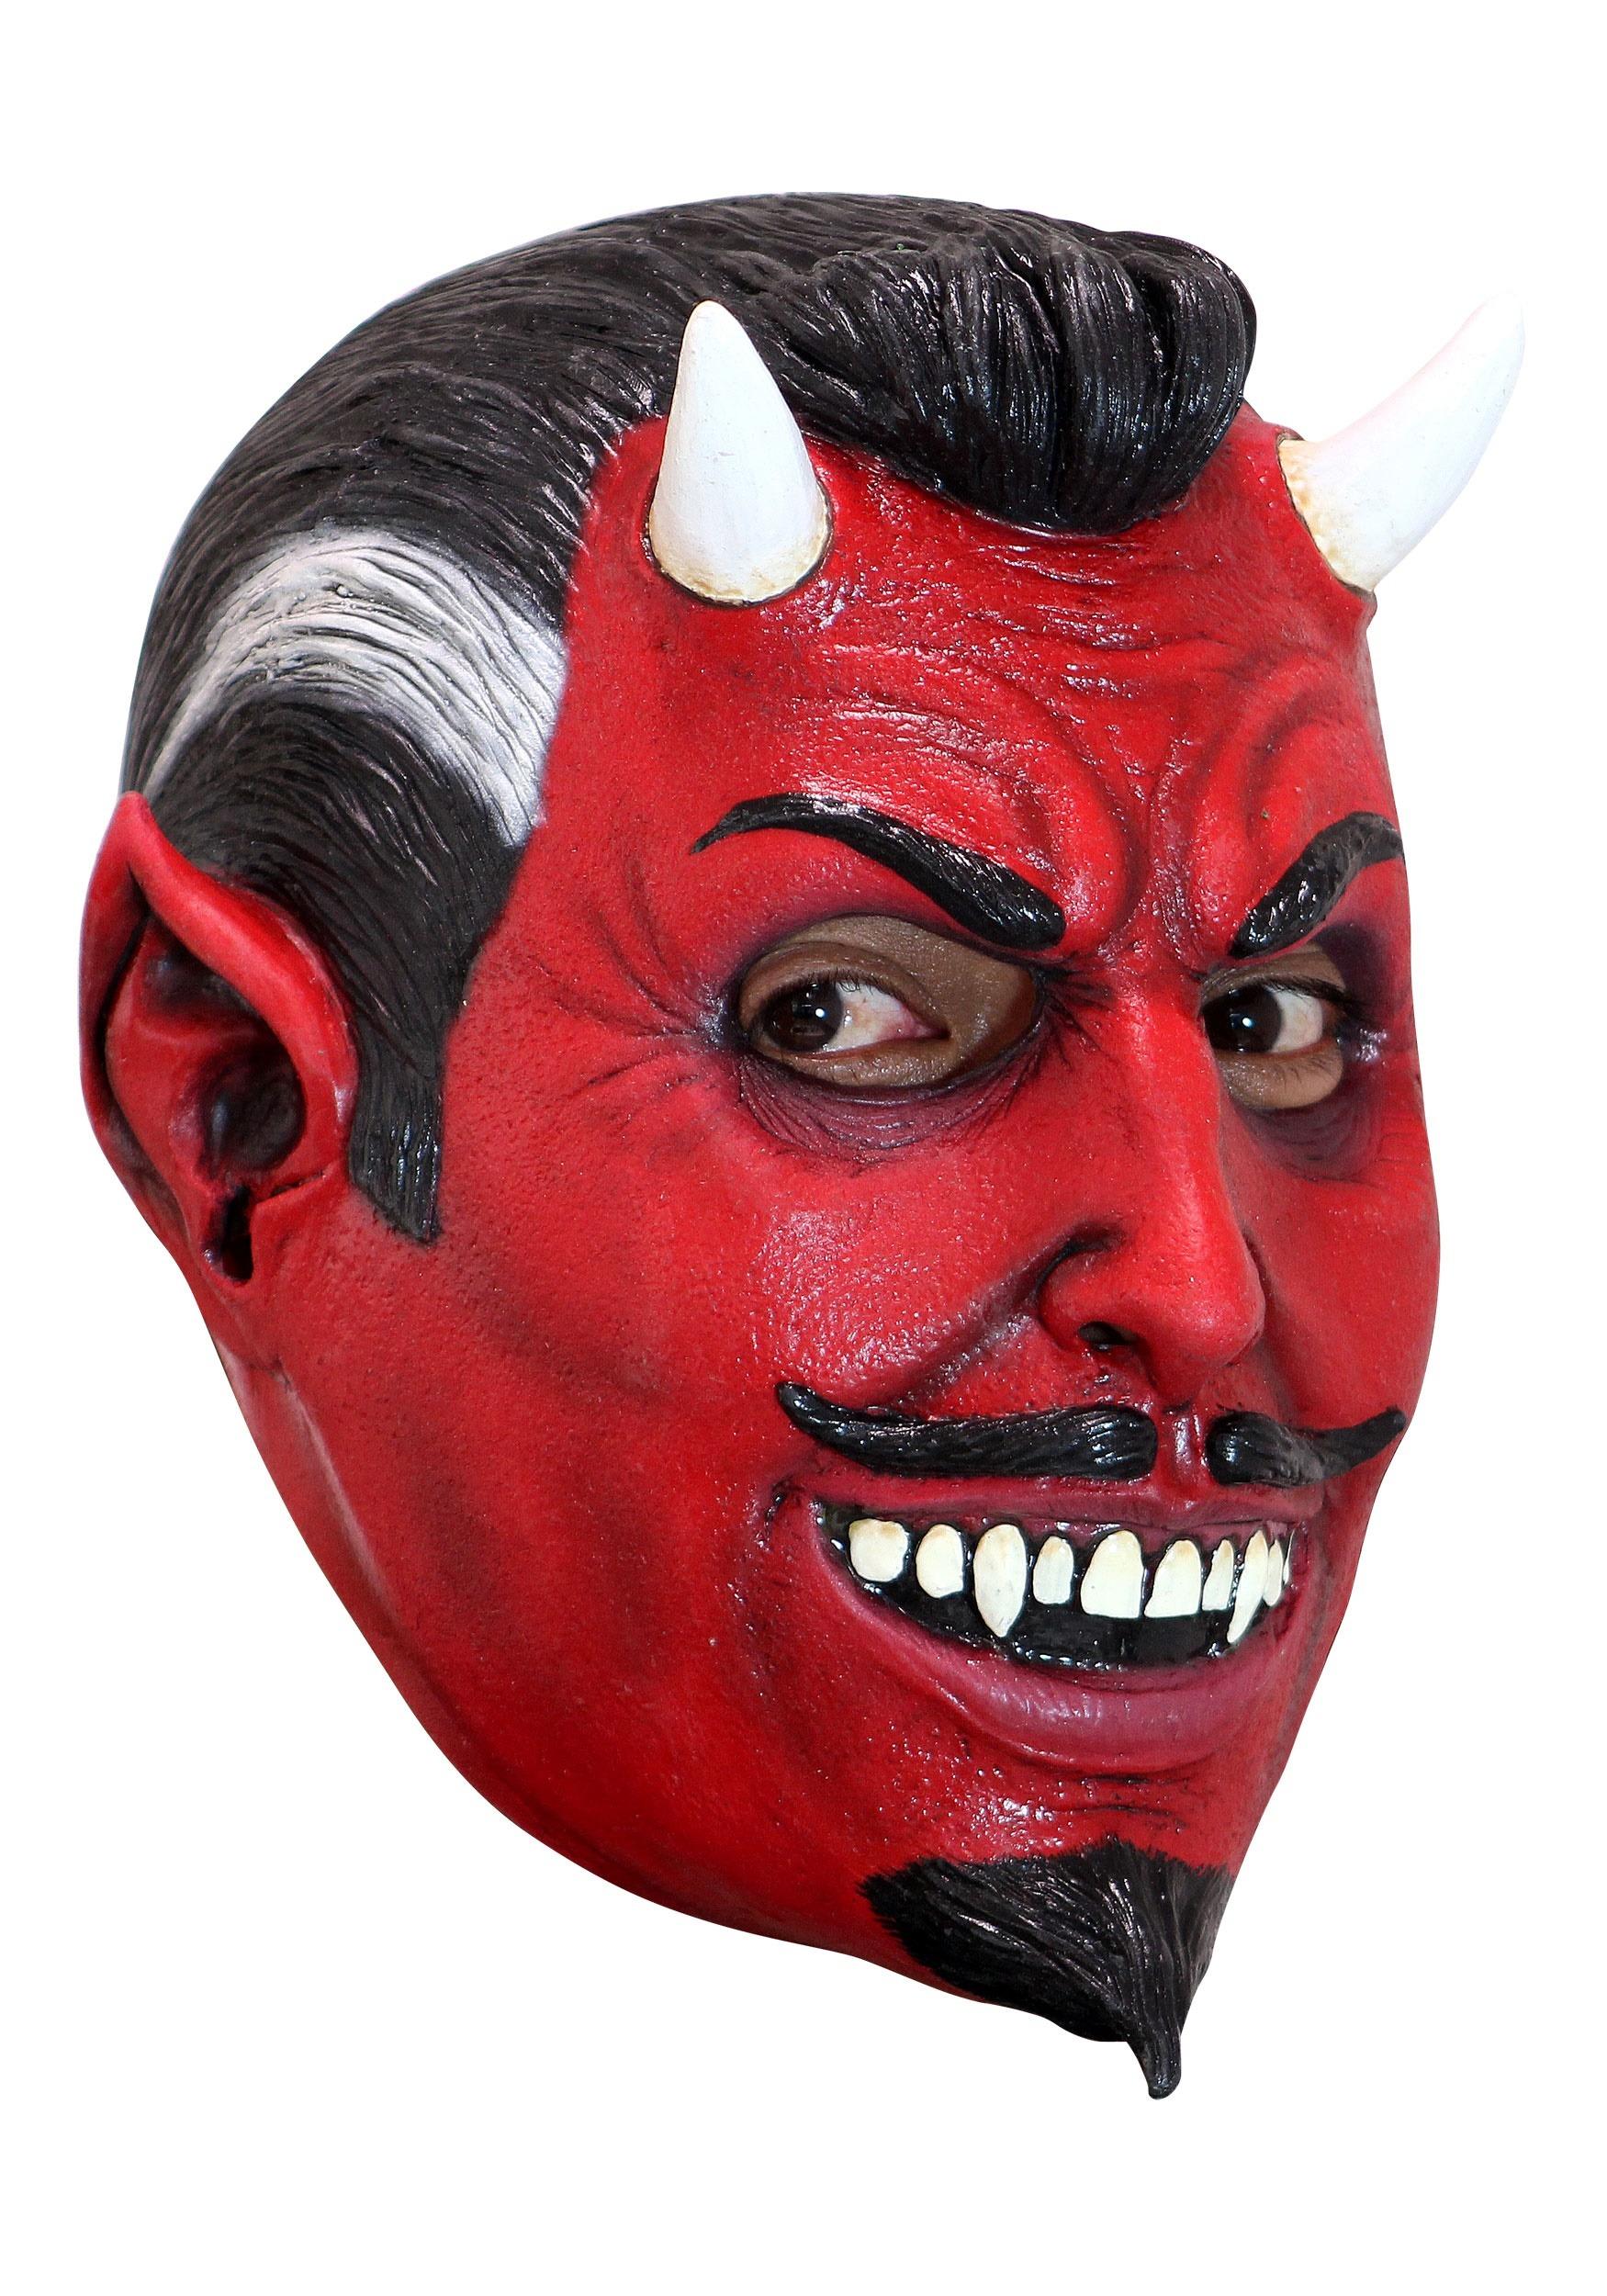 El Diablo Mask for Adults